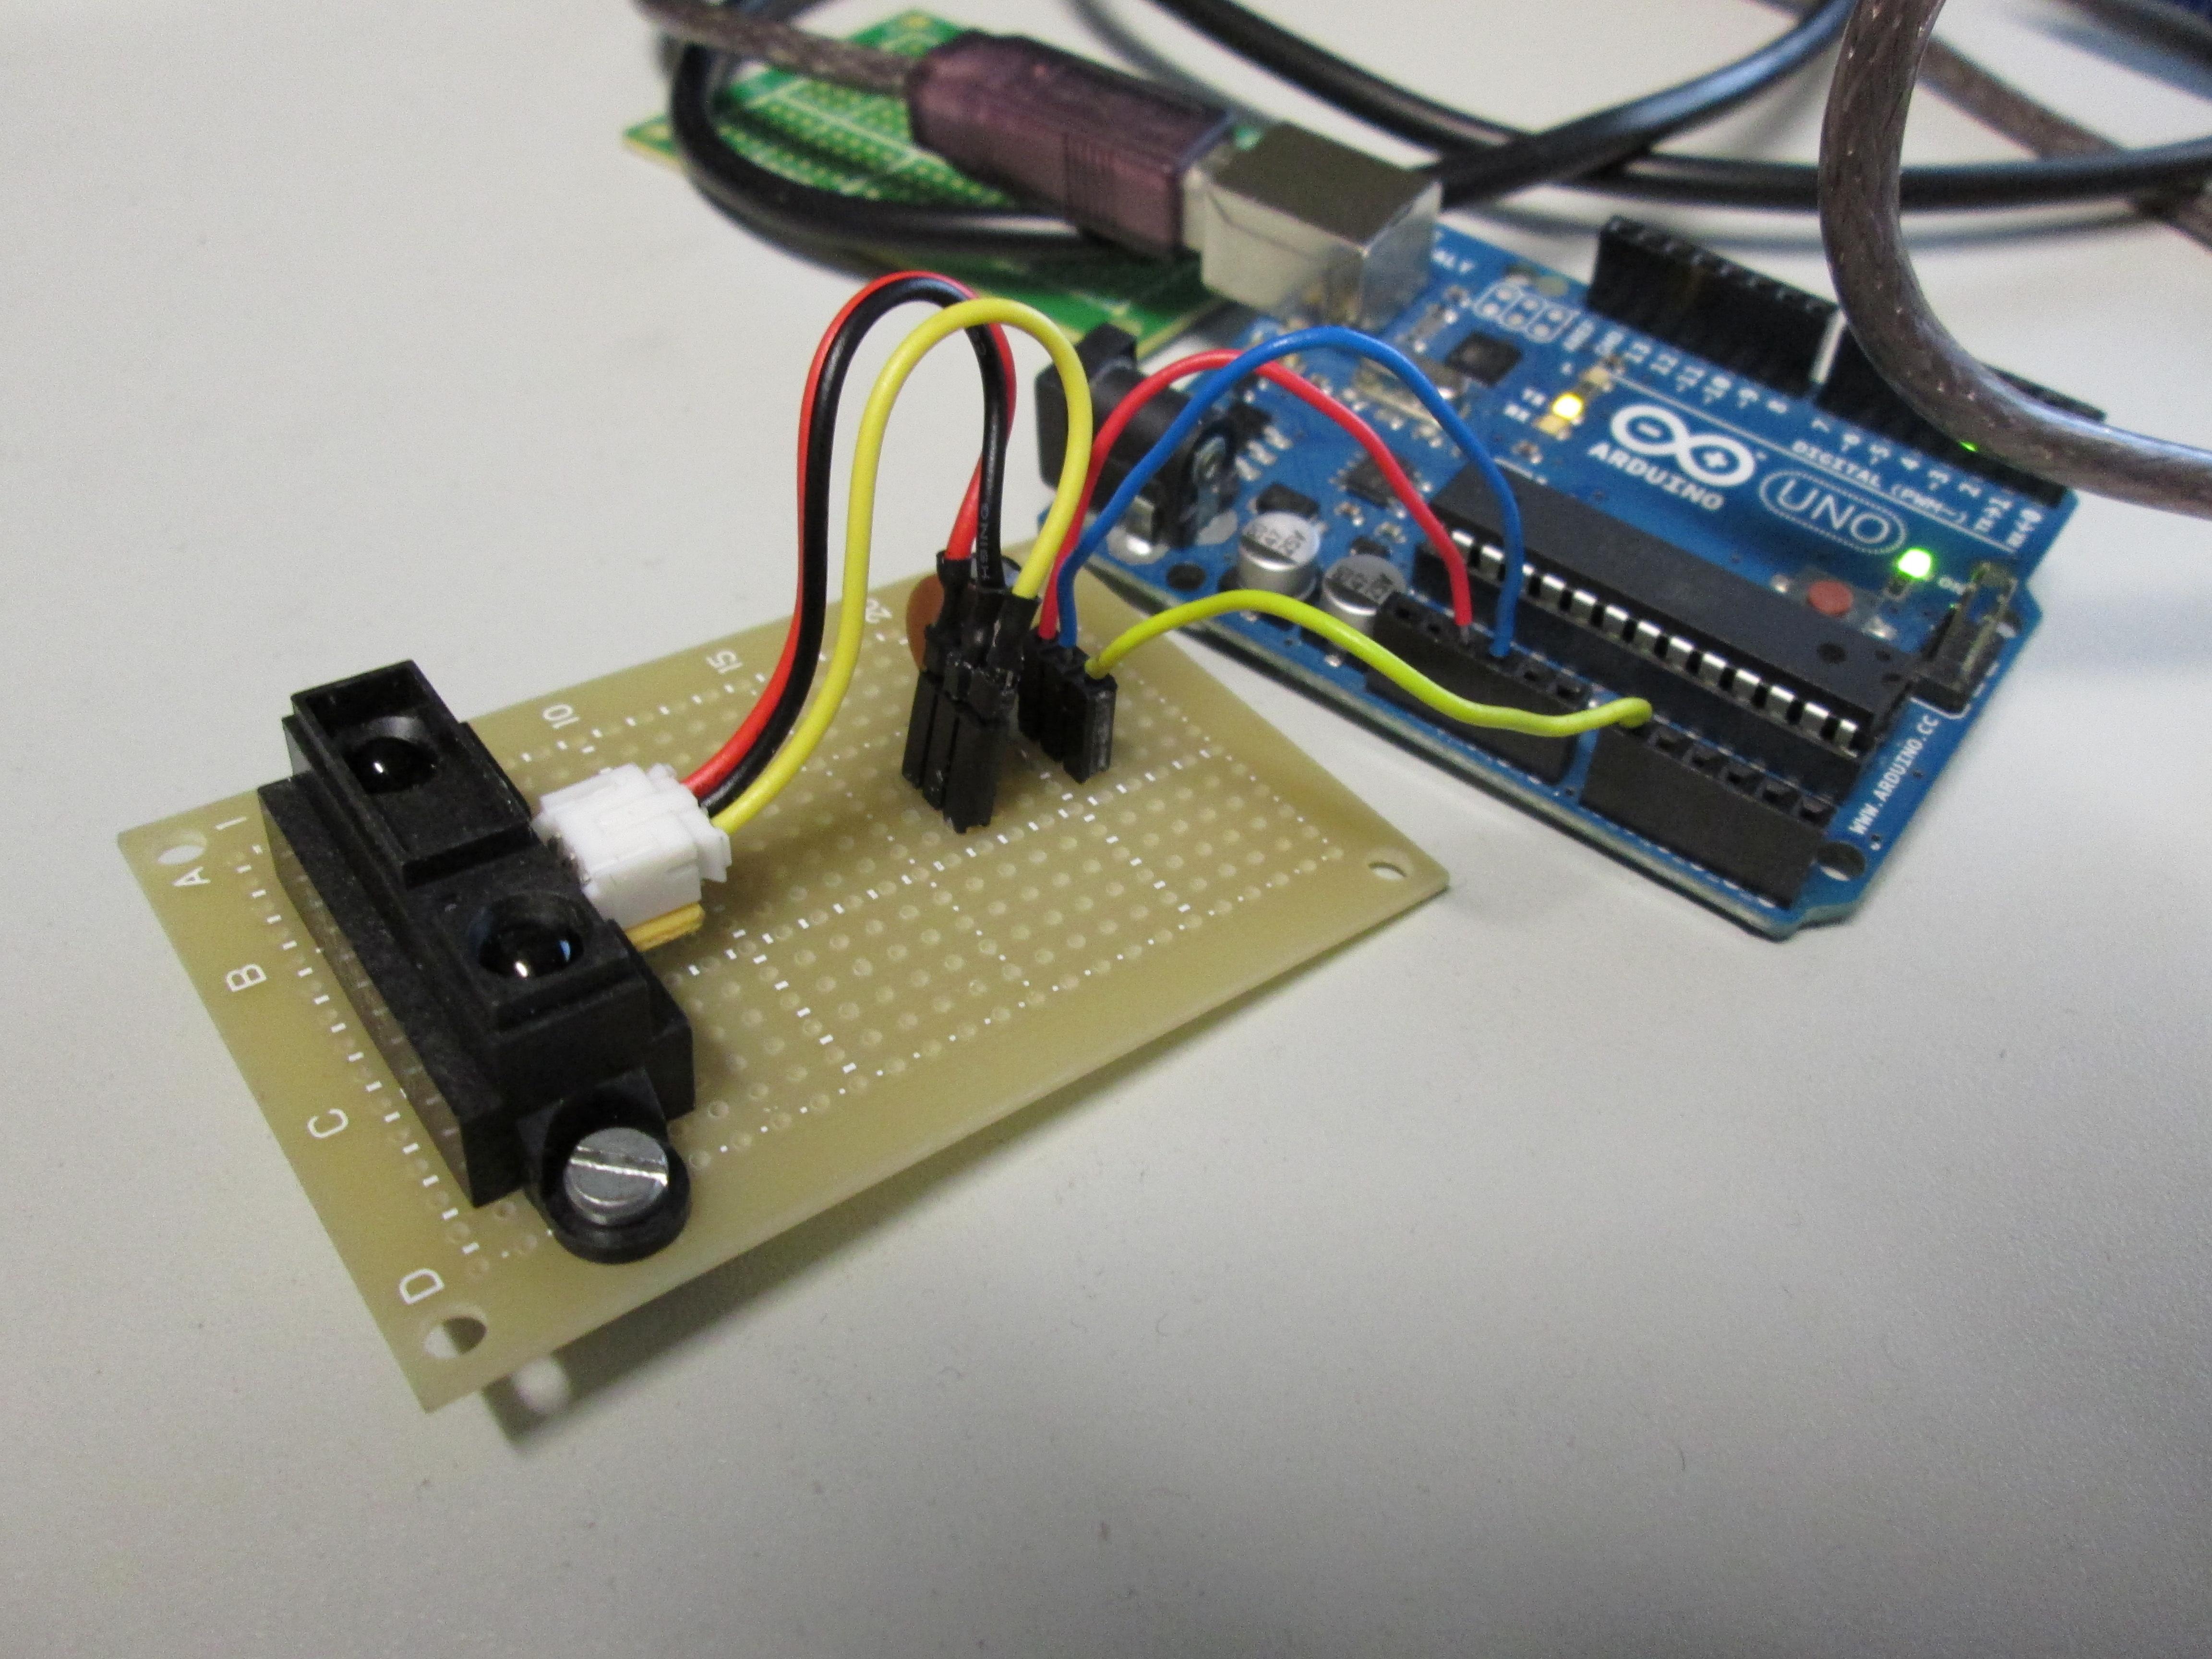 Denoising Sharp Infrared Sensor Chikashi Miyama Ir Proximity Distance Arduino And Two Capacitor For Data Stabilization